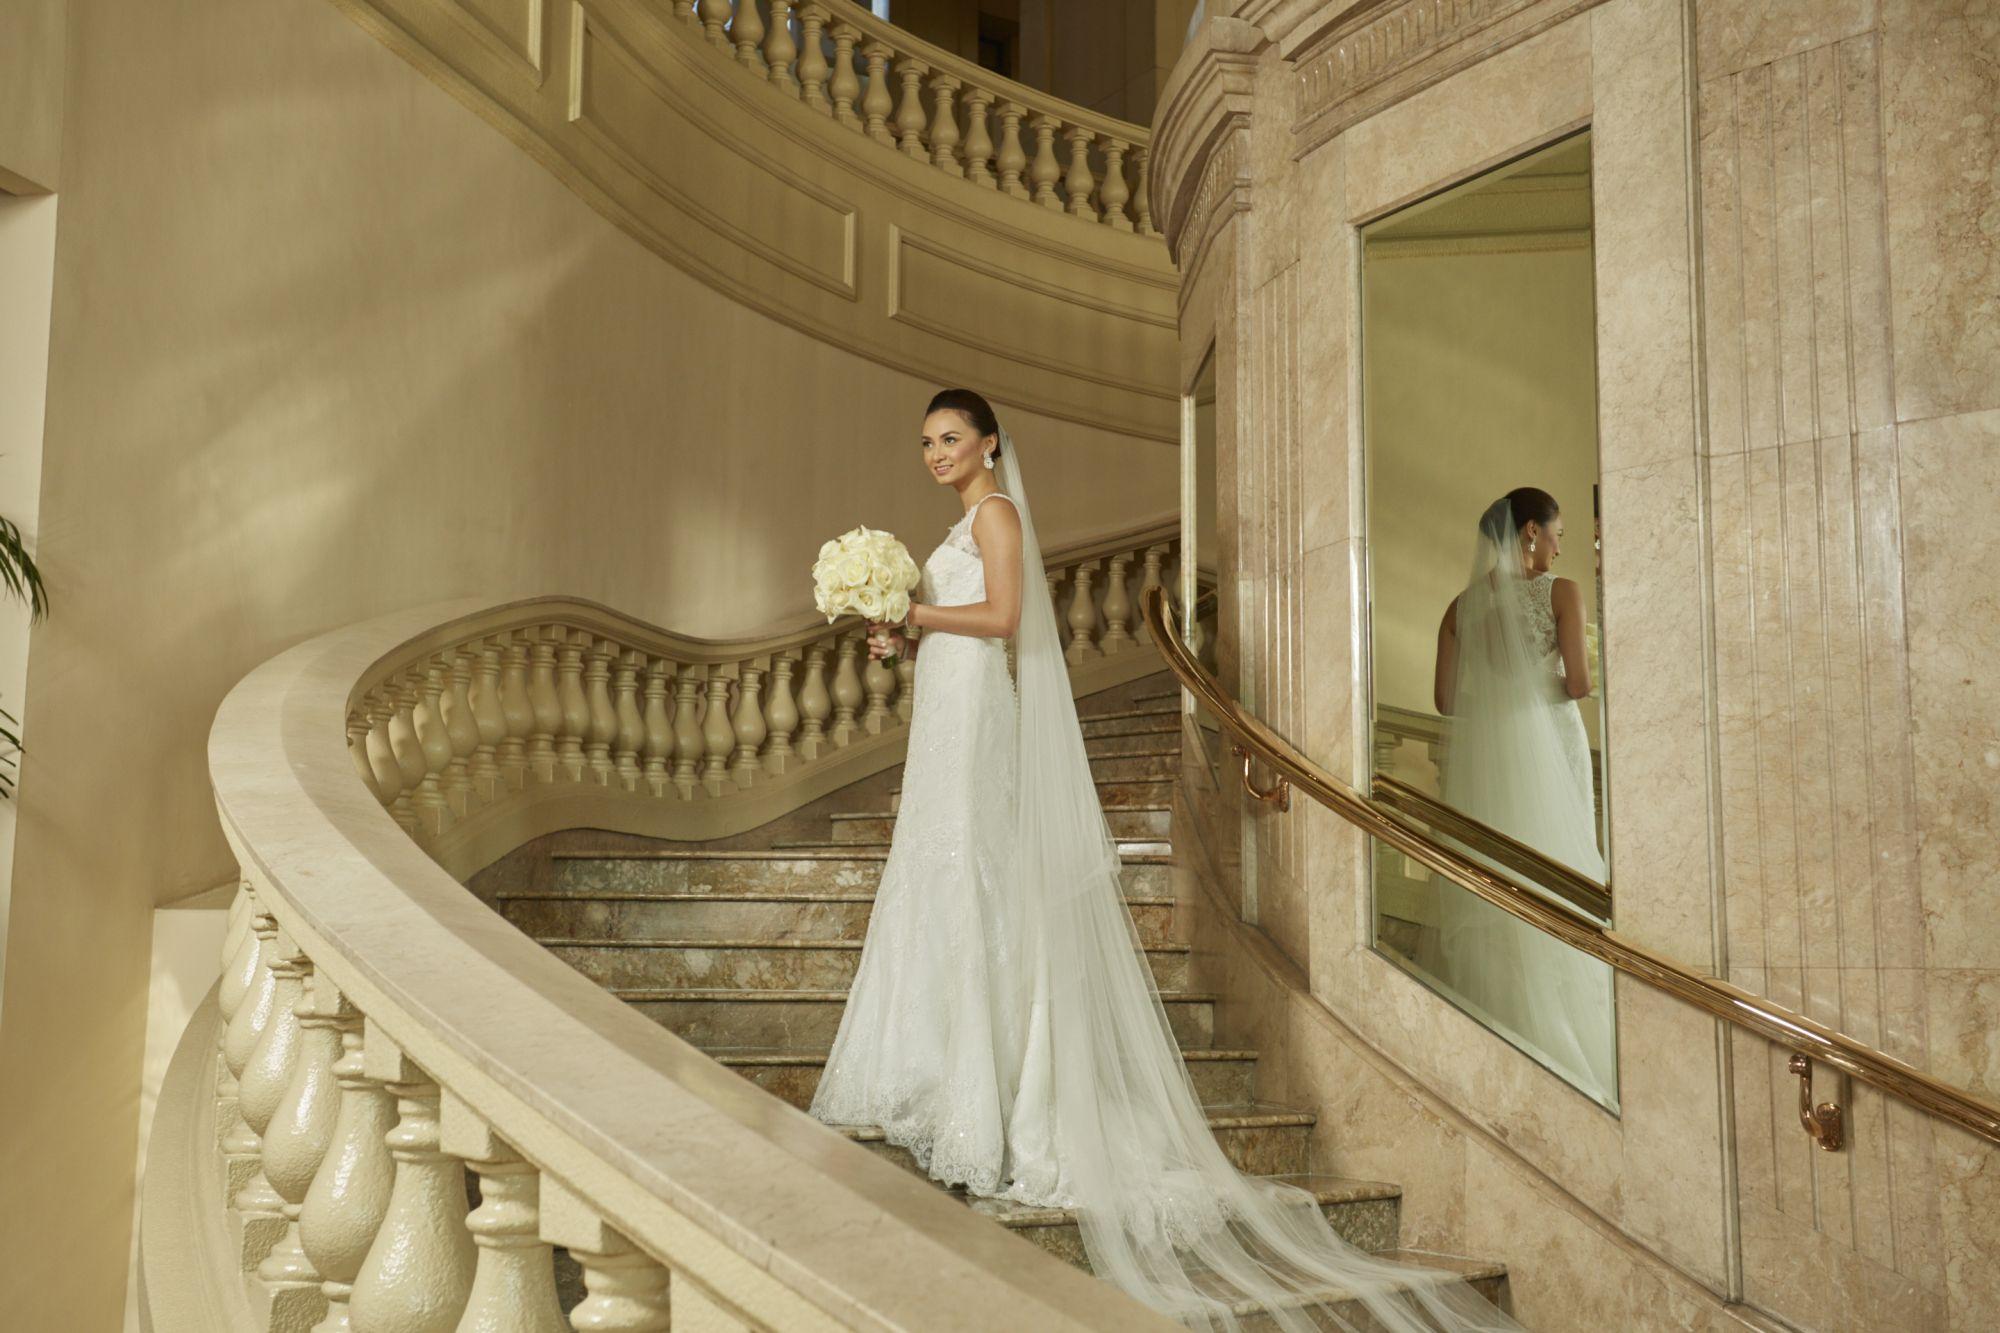 The Love Affair: 42 Years of Bespoke Weddings at The Peninsula Manila